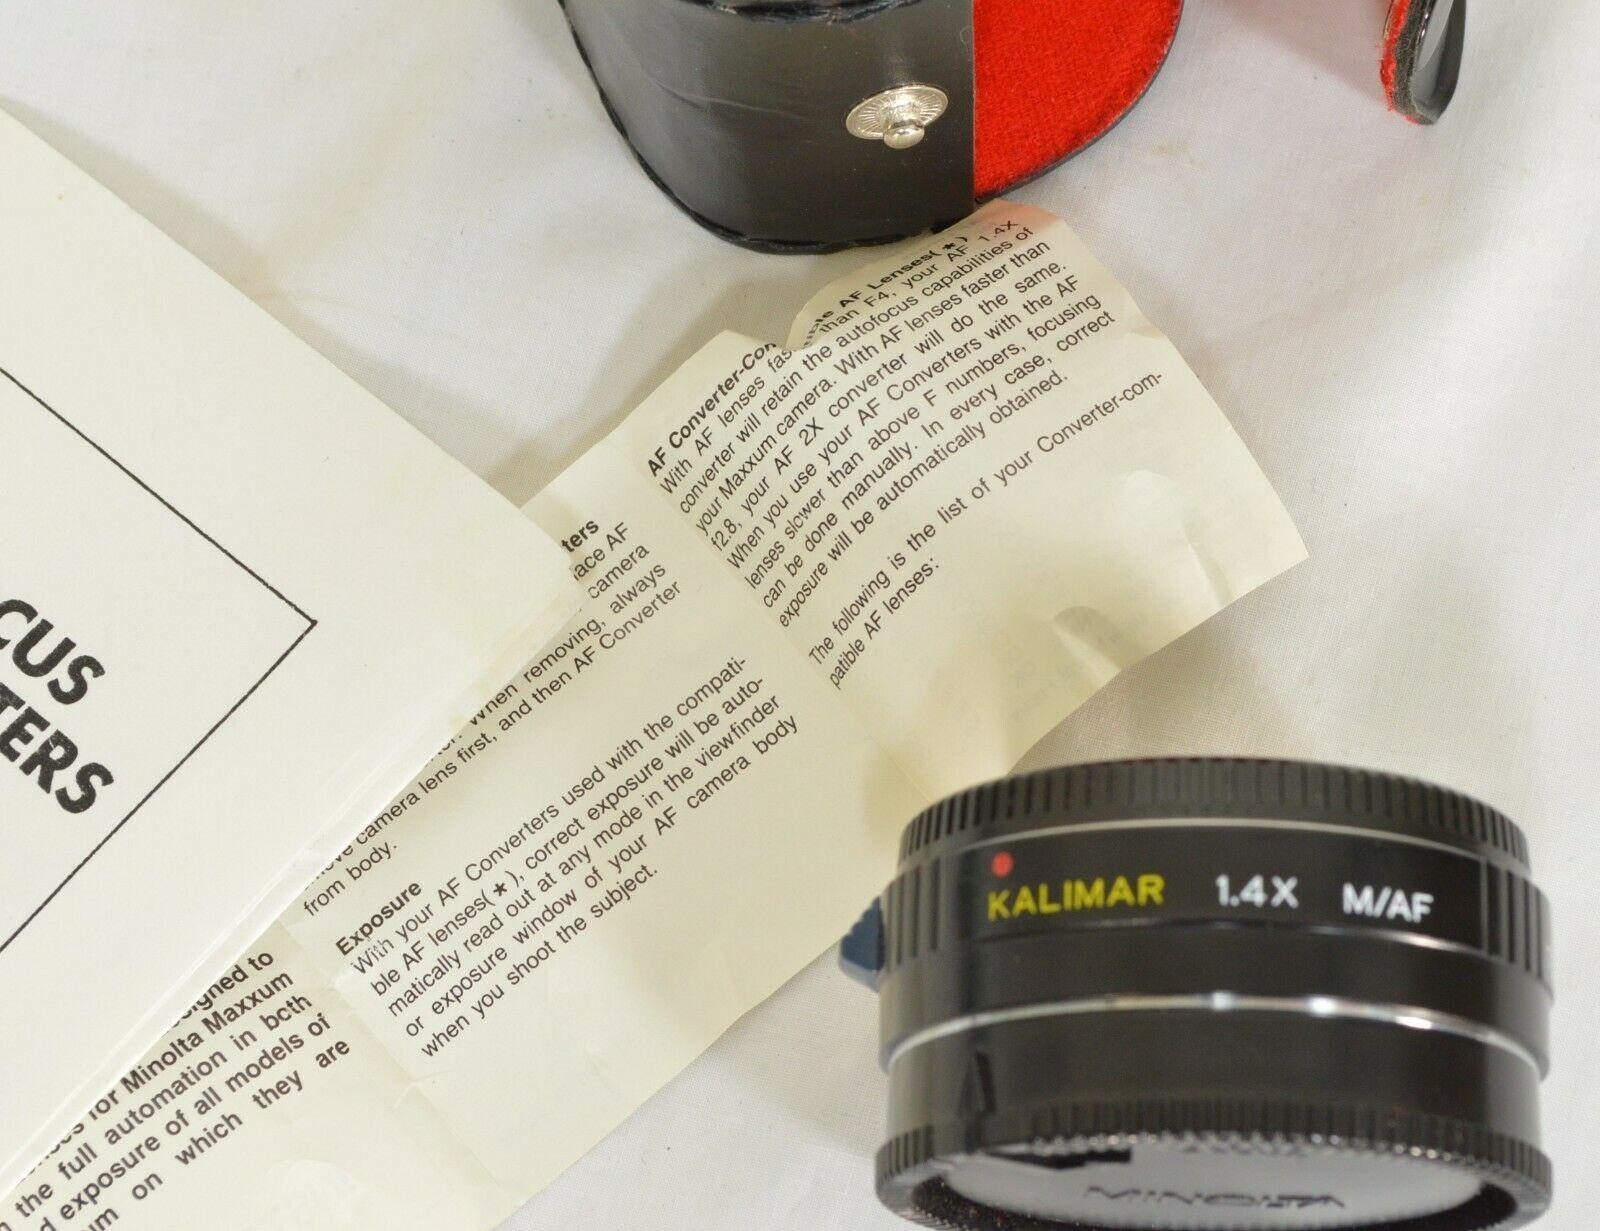 Kalimar 1.4 X M/AF Tele Converter Auto Focus camera lens w/ case & instructions image 10